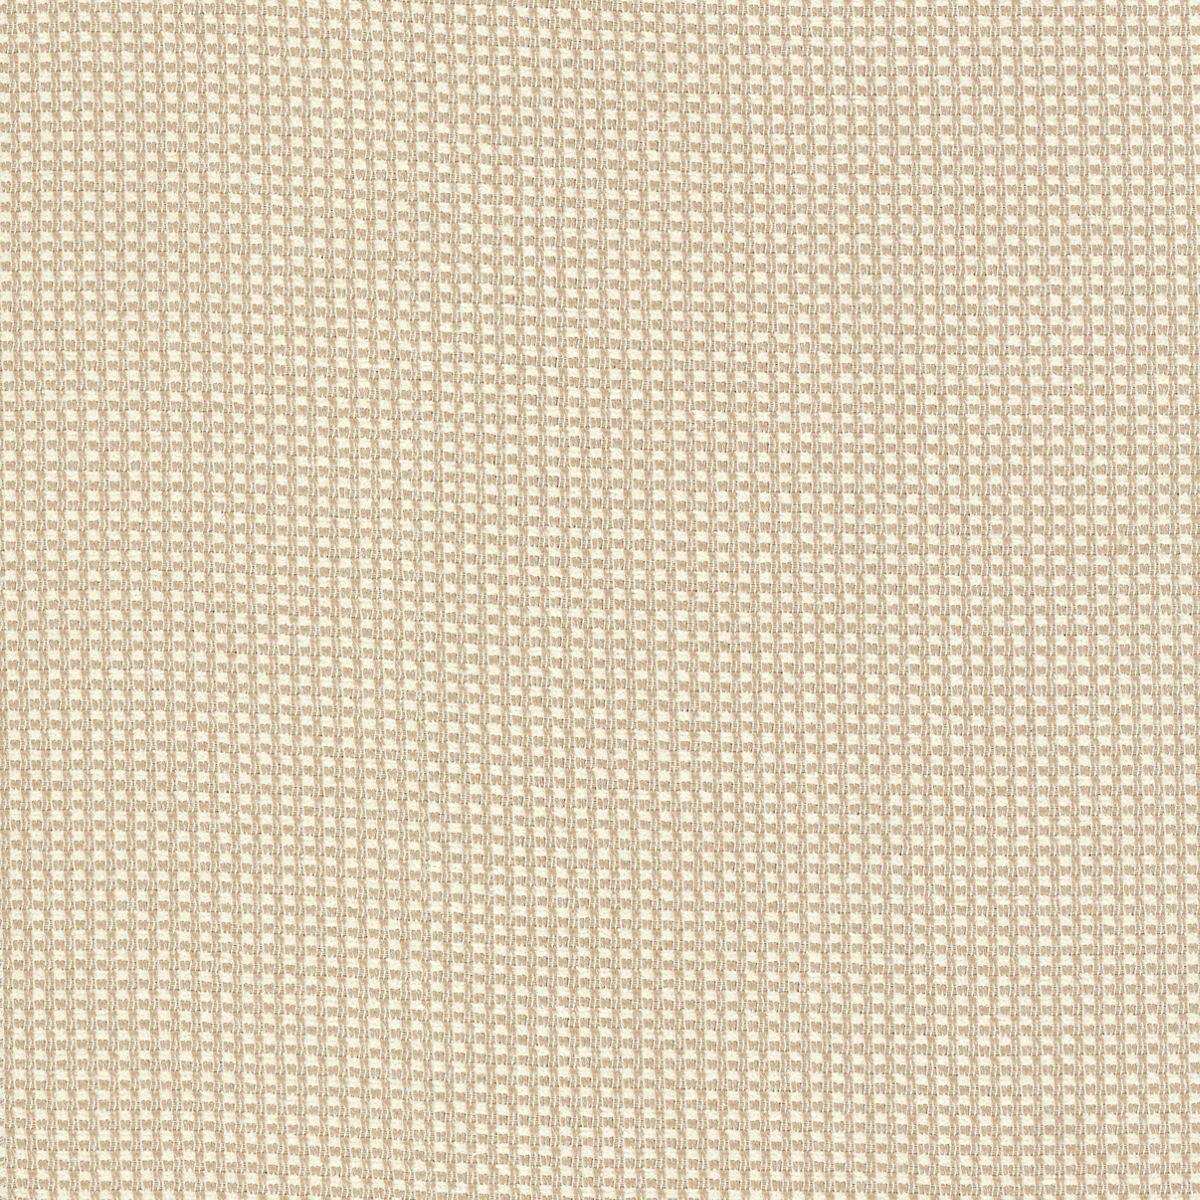 Checkered Cream/Natural Fabric